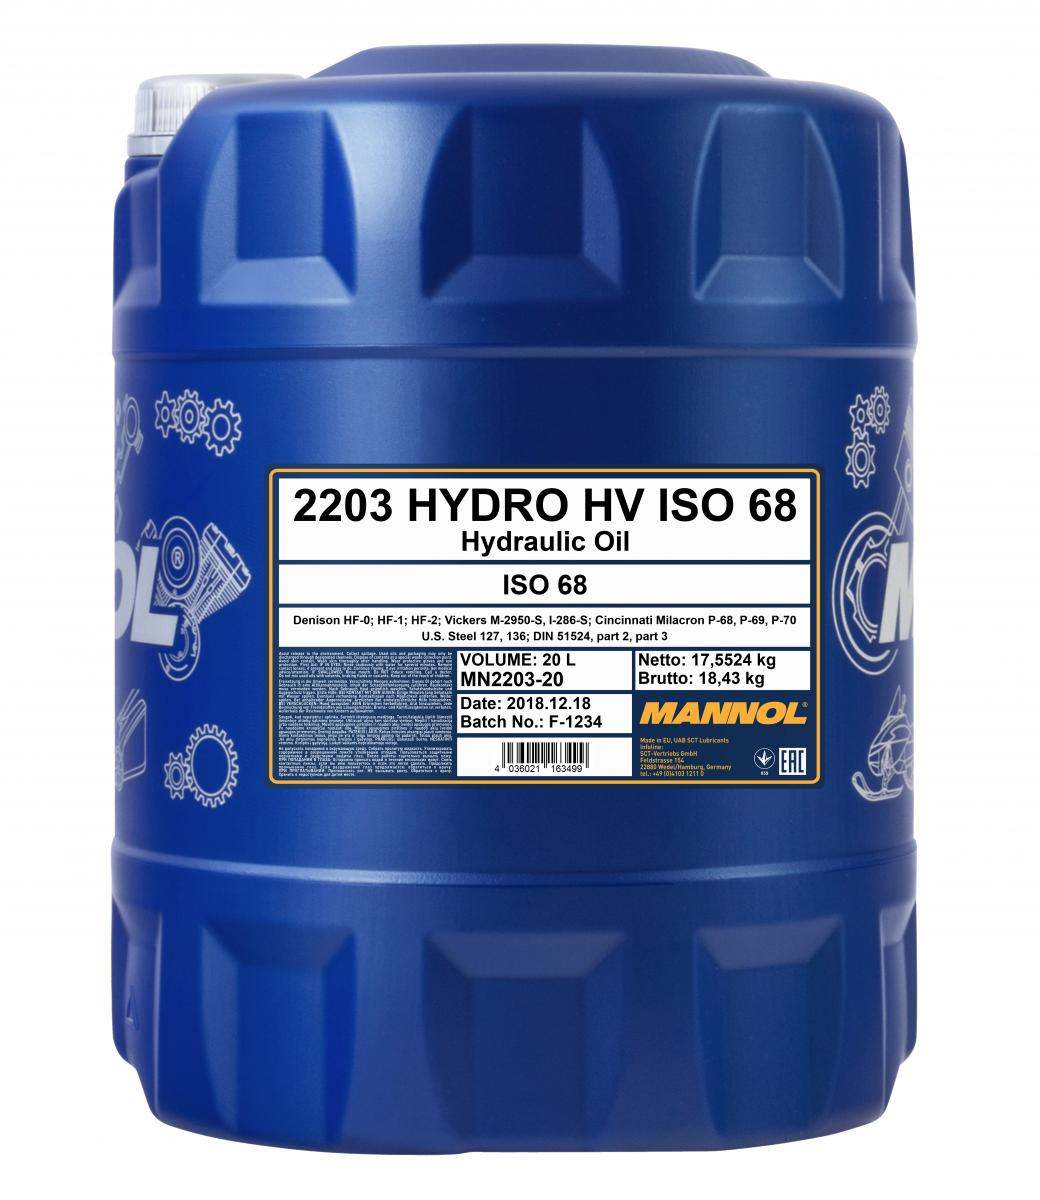 Hydro HV ISO 68